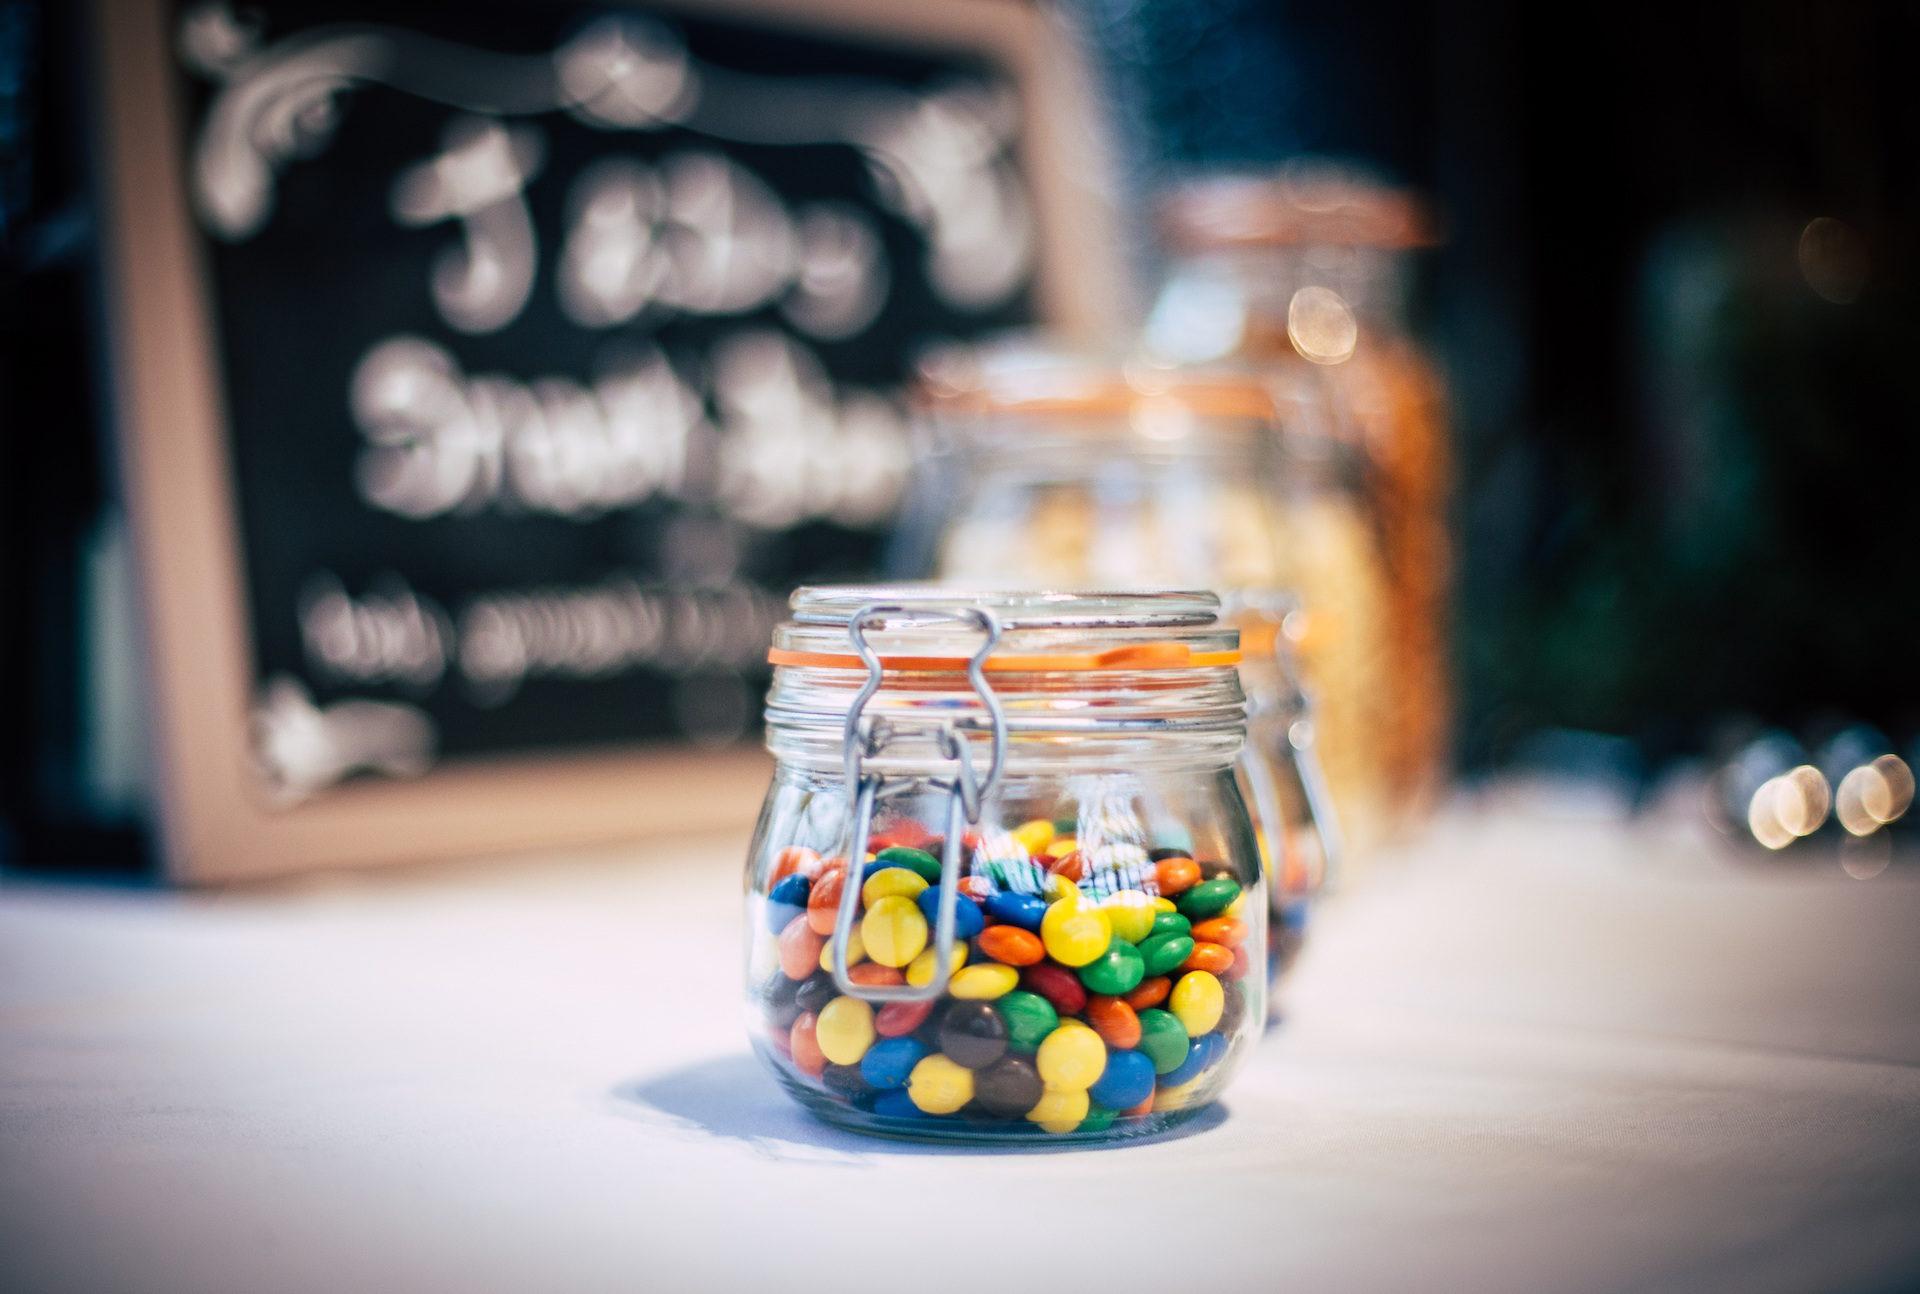 प्यारा, caramelos, कैंडी, tarro, रंगीन - HD वॉलपेपर - प्रोफेसर-falken.com